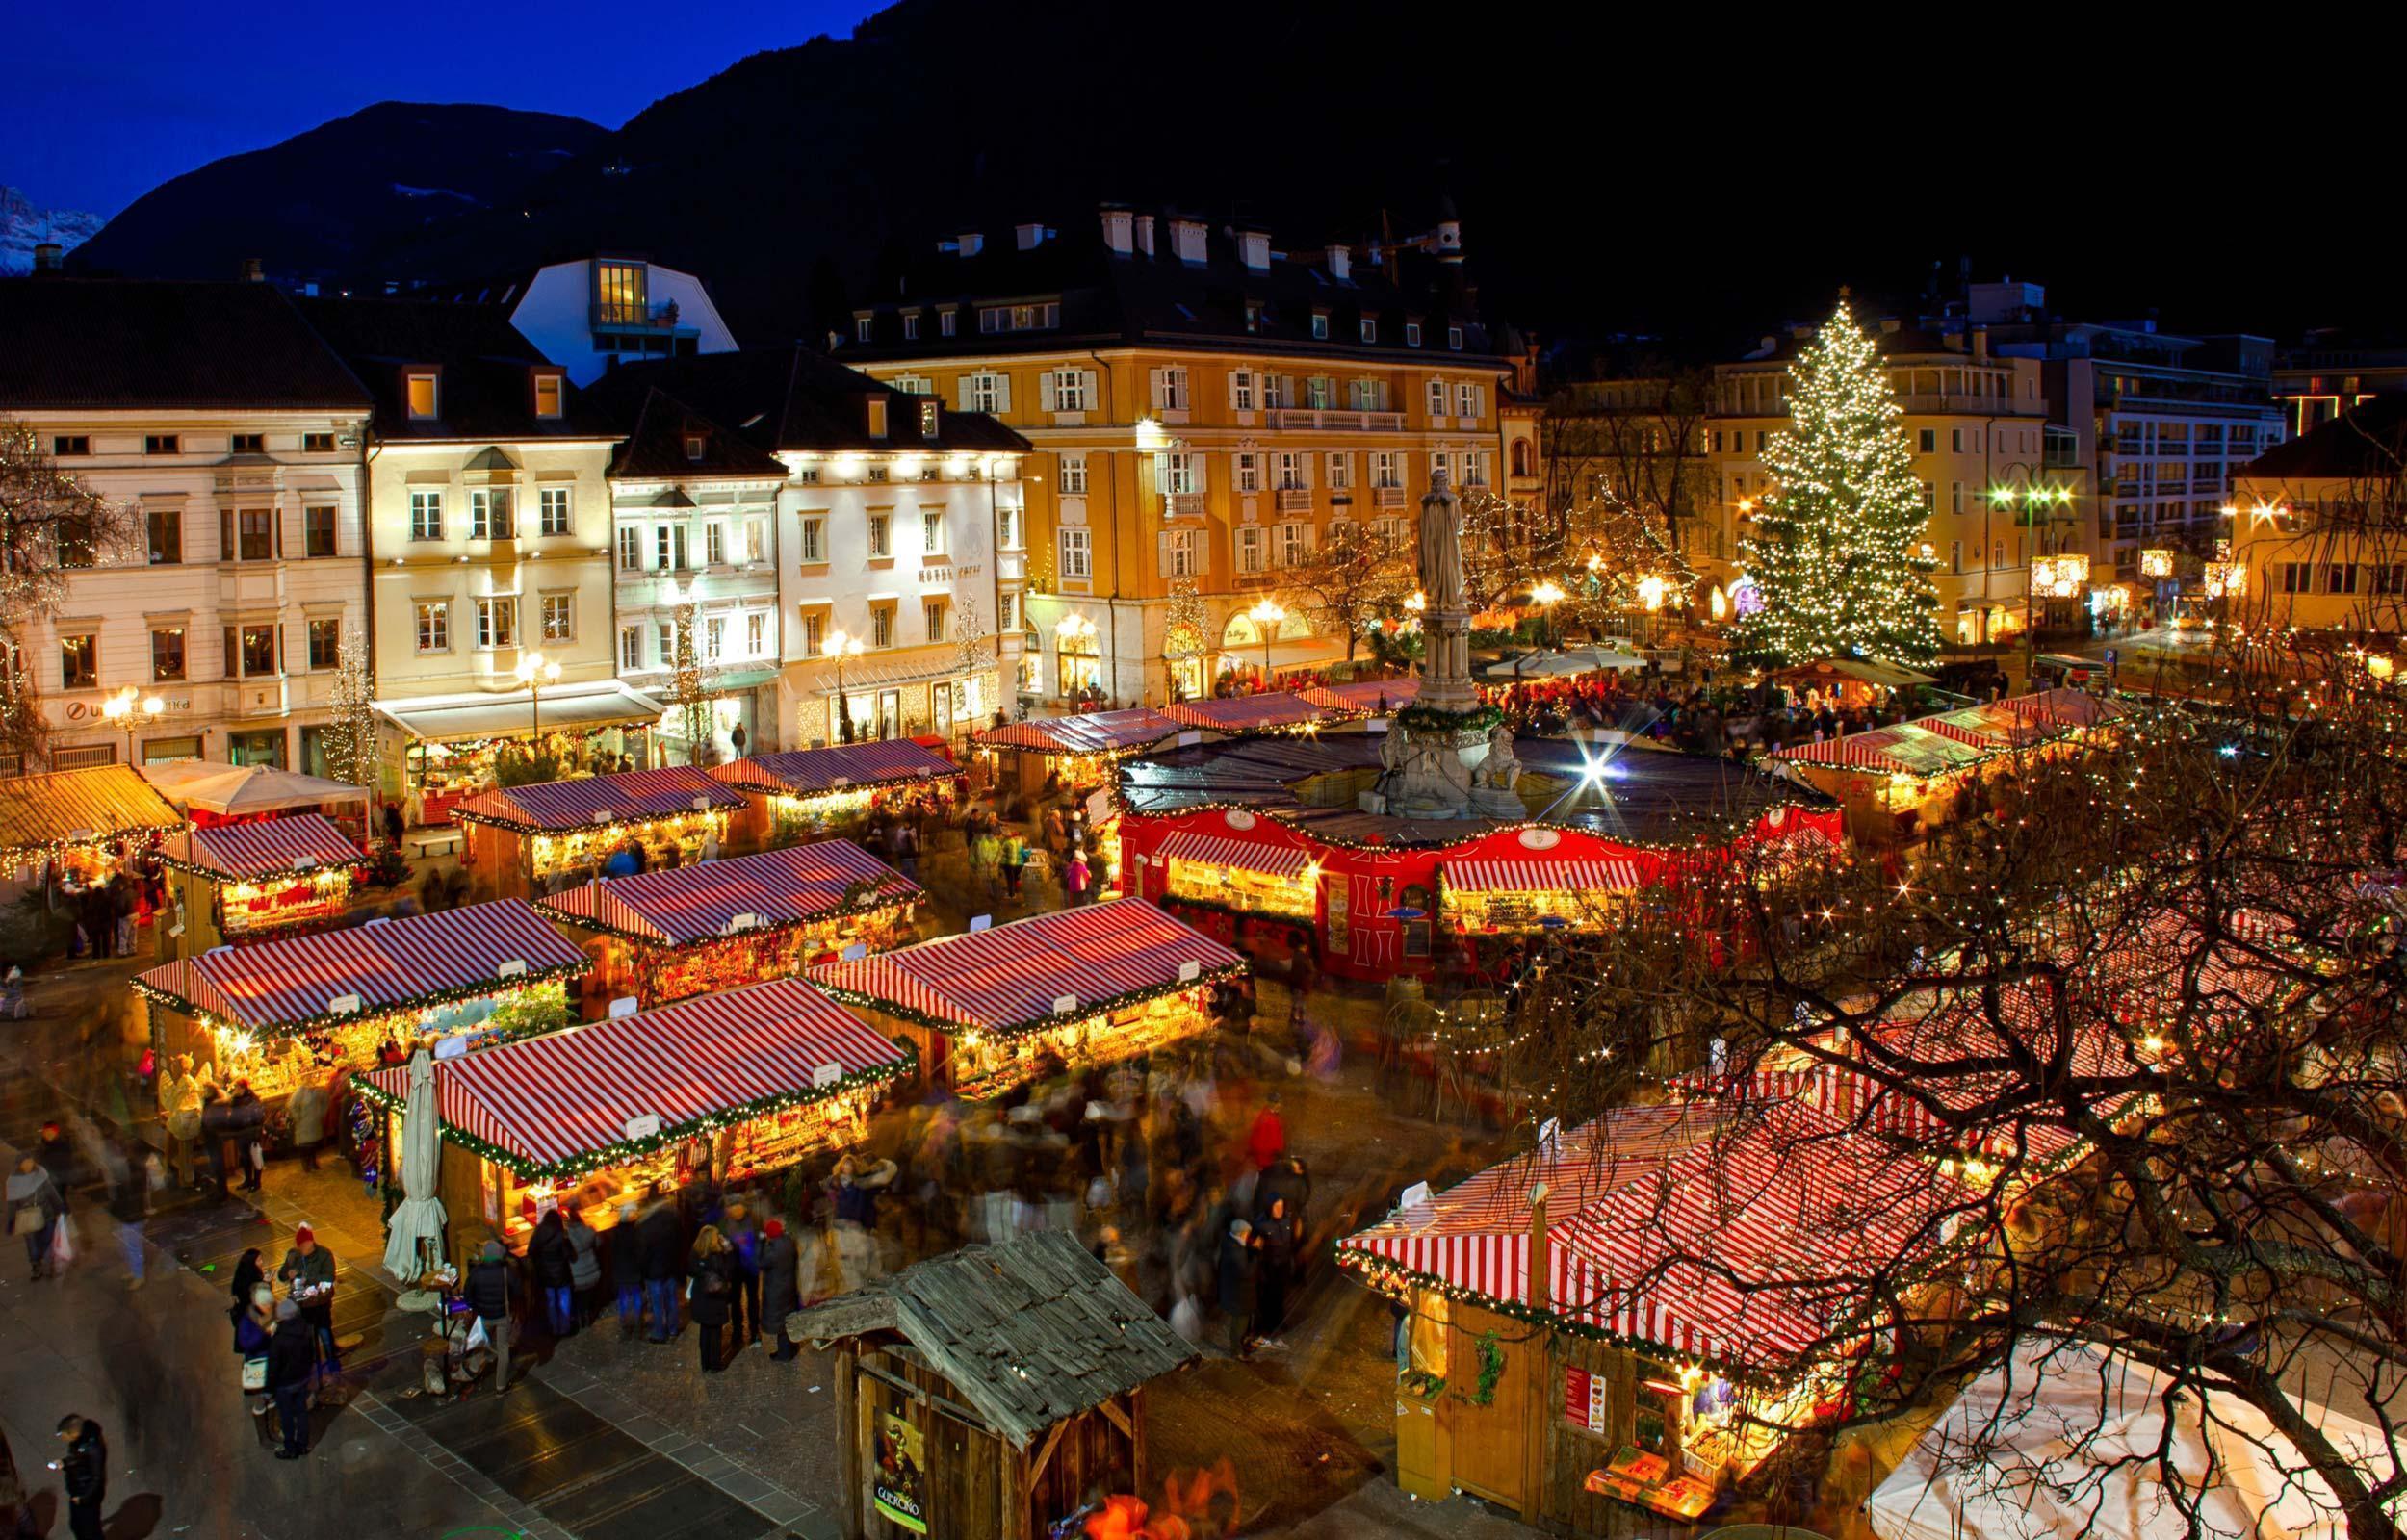 Atmosfera Natalizia a Merano, Bolzano, Vipiteno e Bressanone